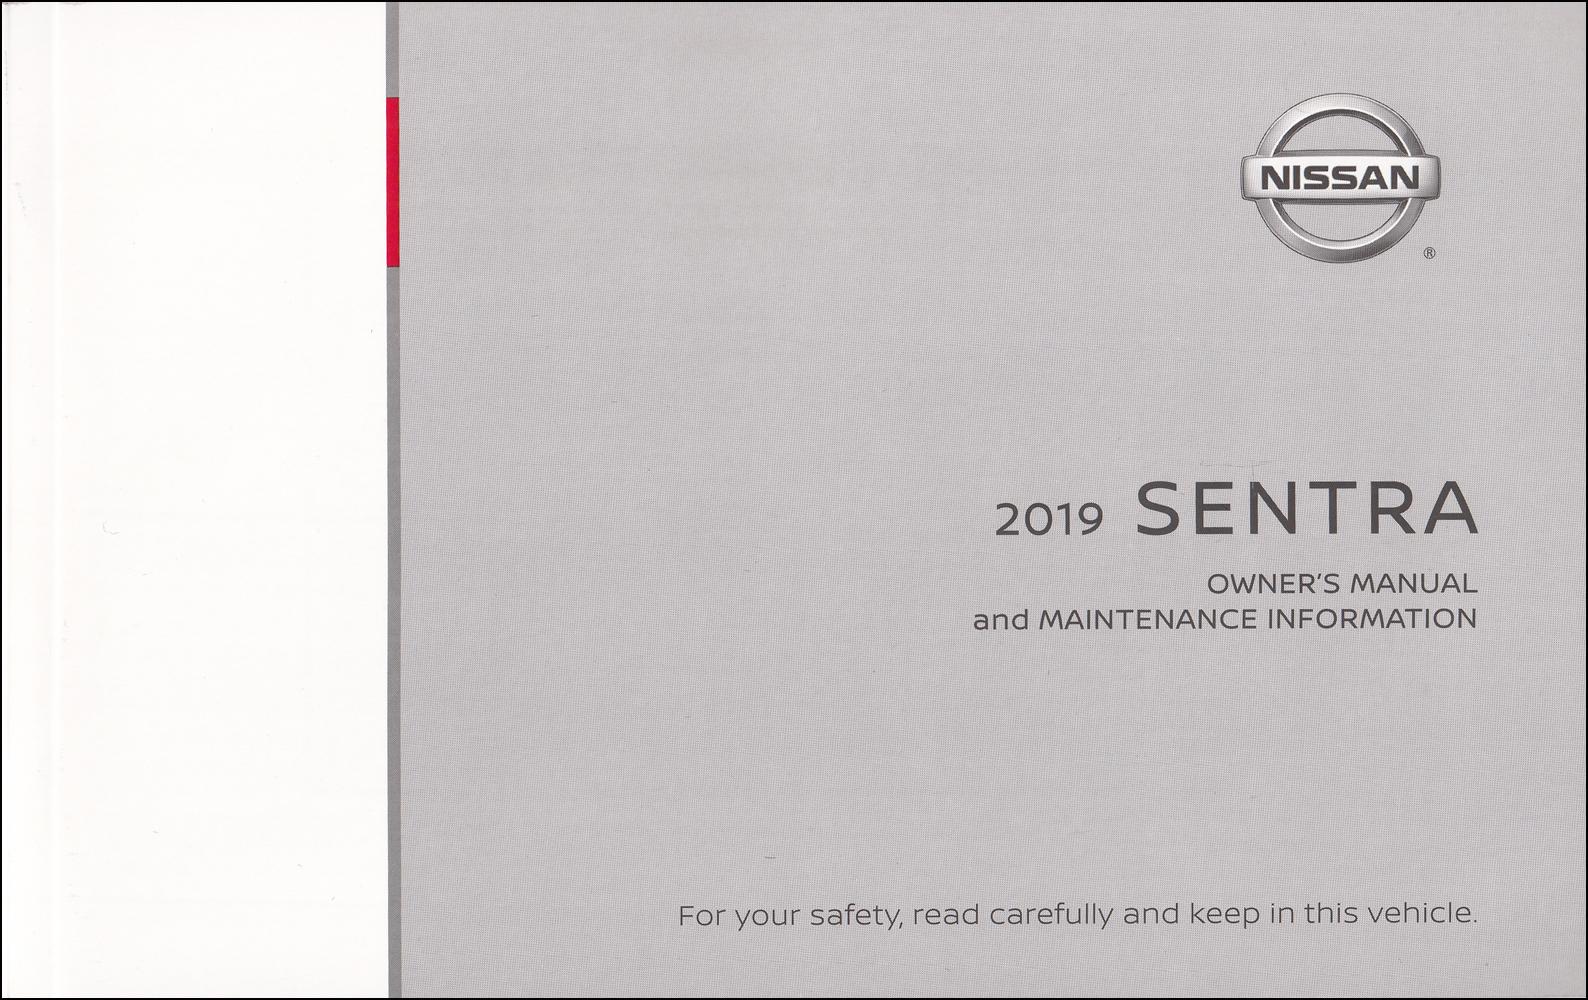 New 2019 Nissan Sentra Manual Guide